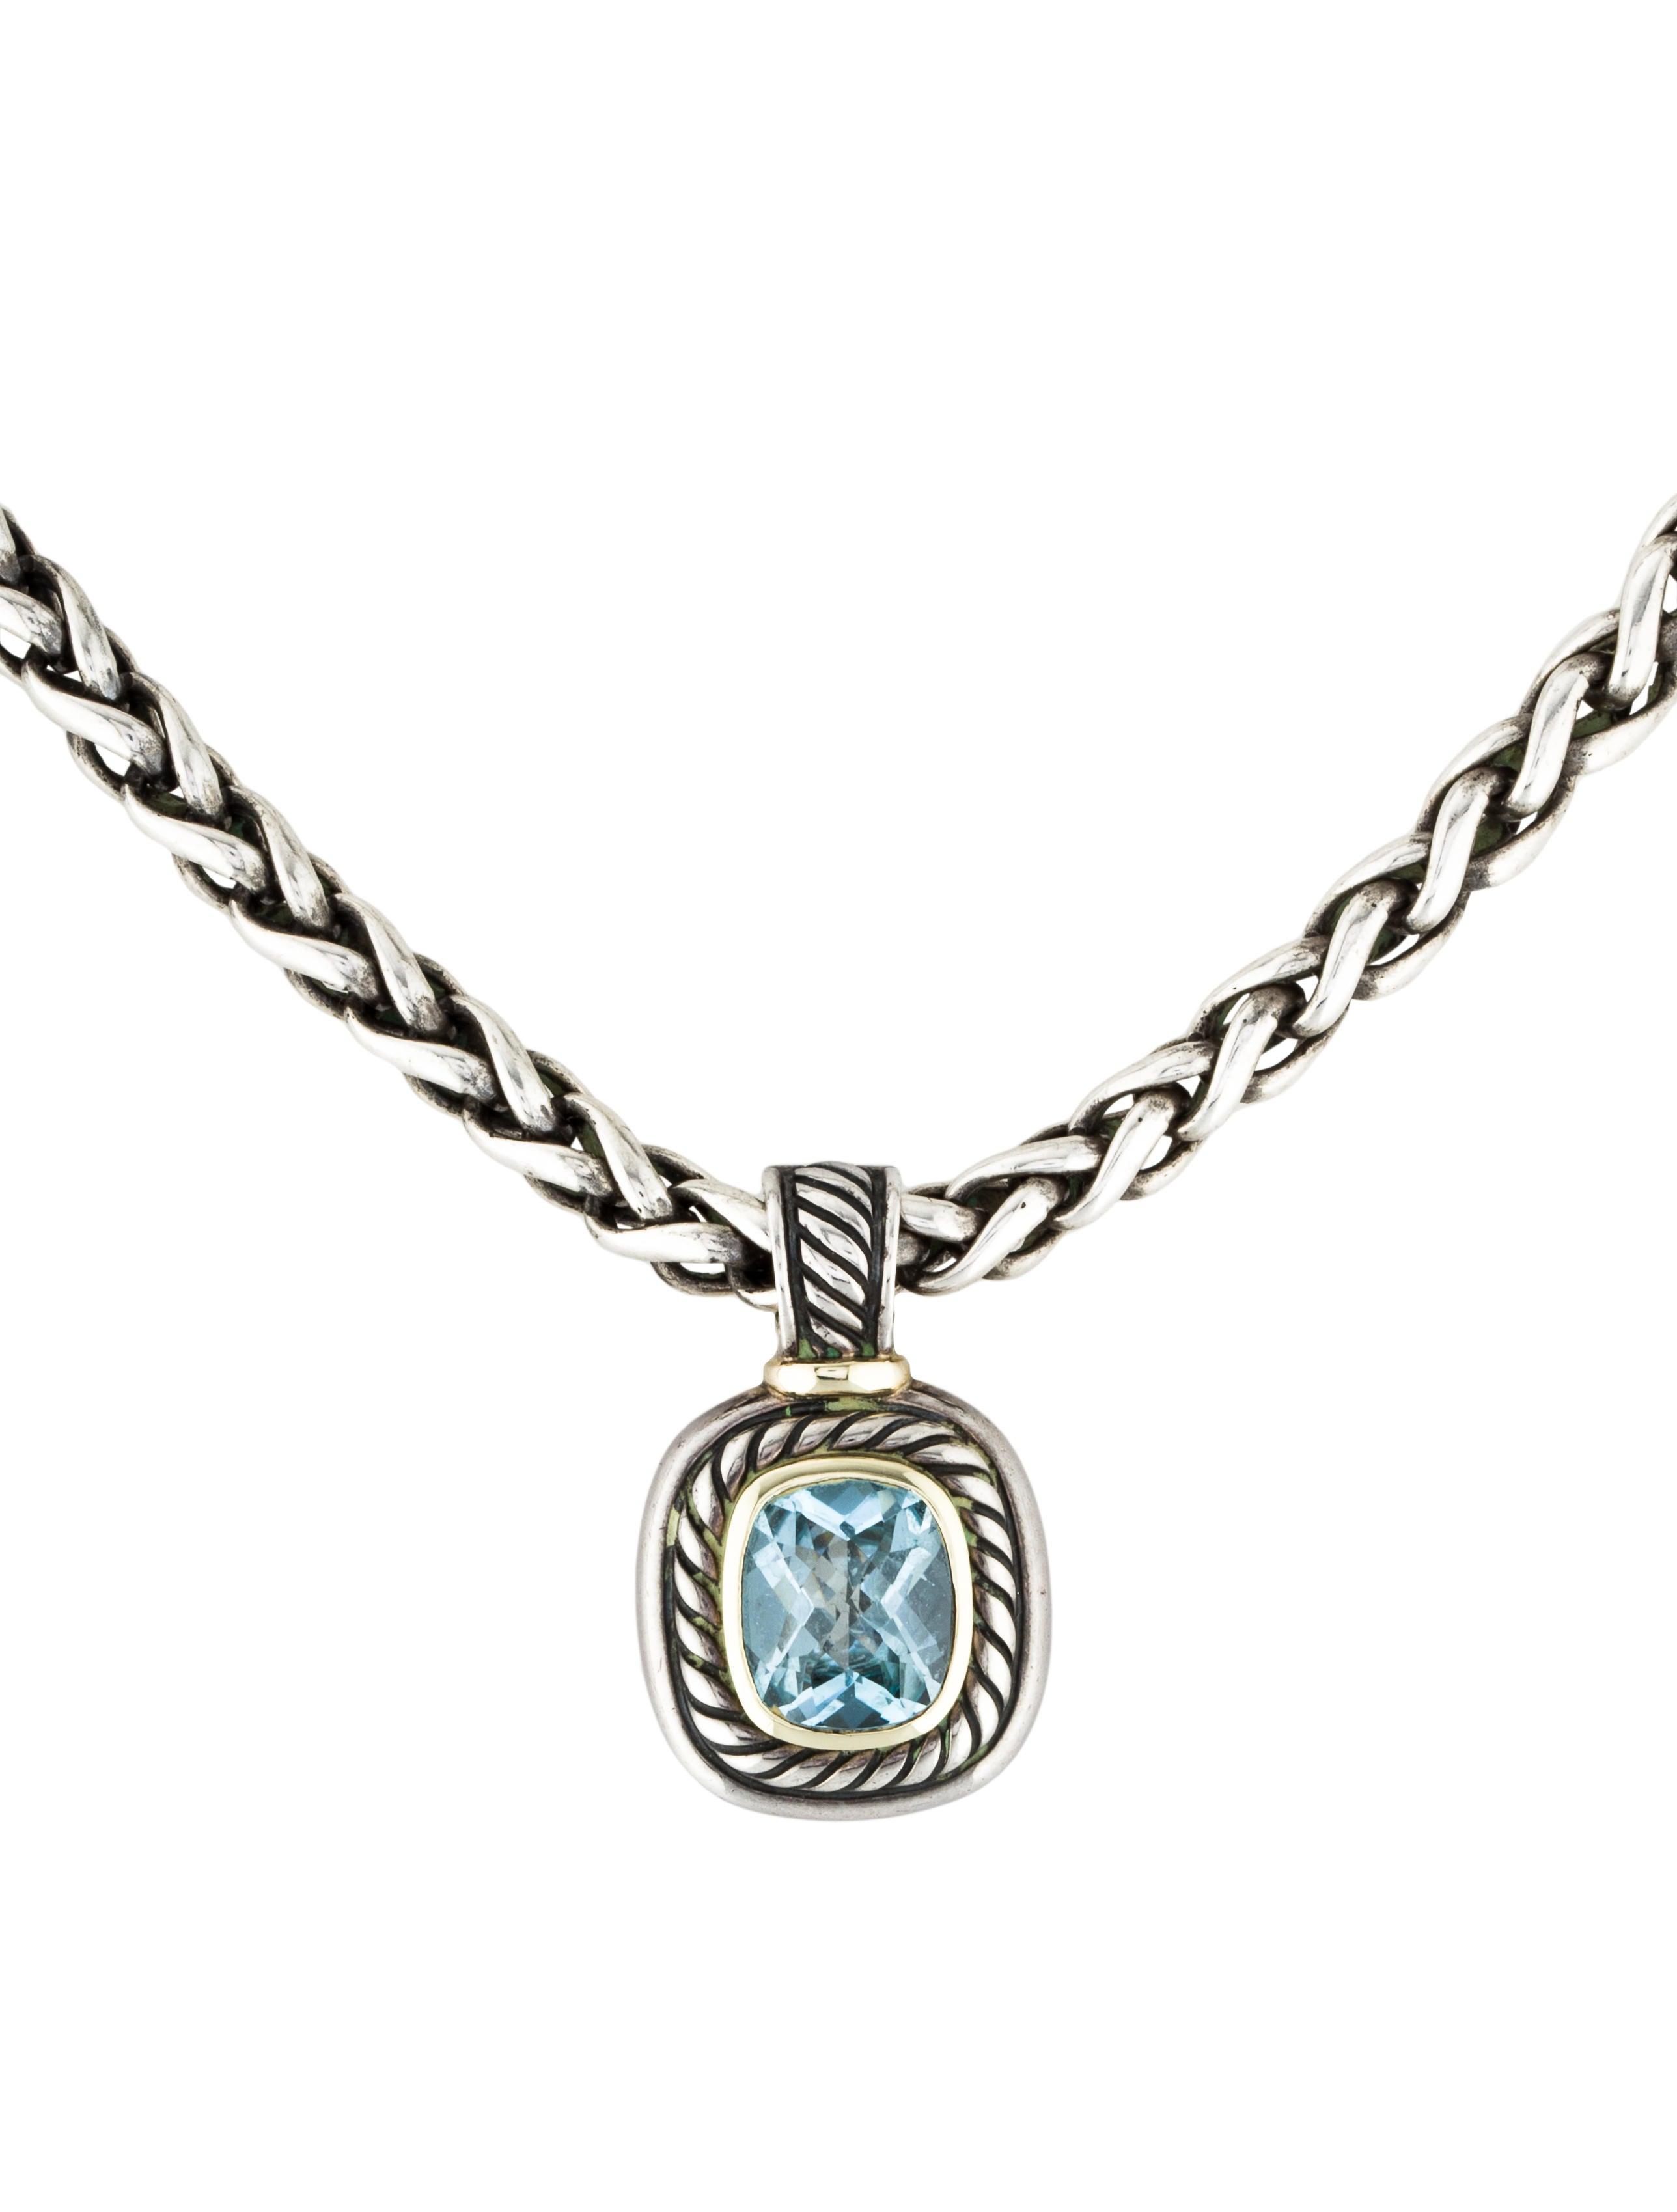 David Yurman Two Tone Blue Topaz Albion Pendant Necklace